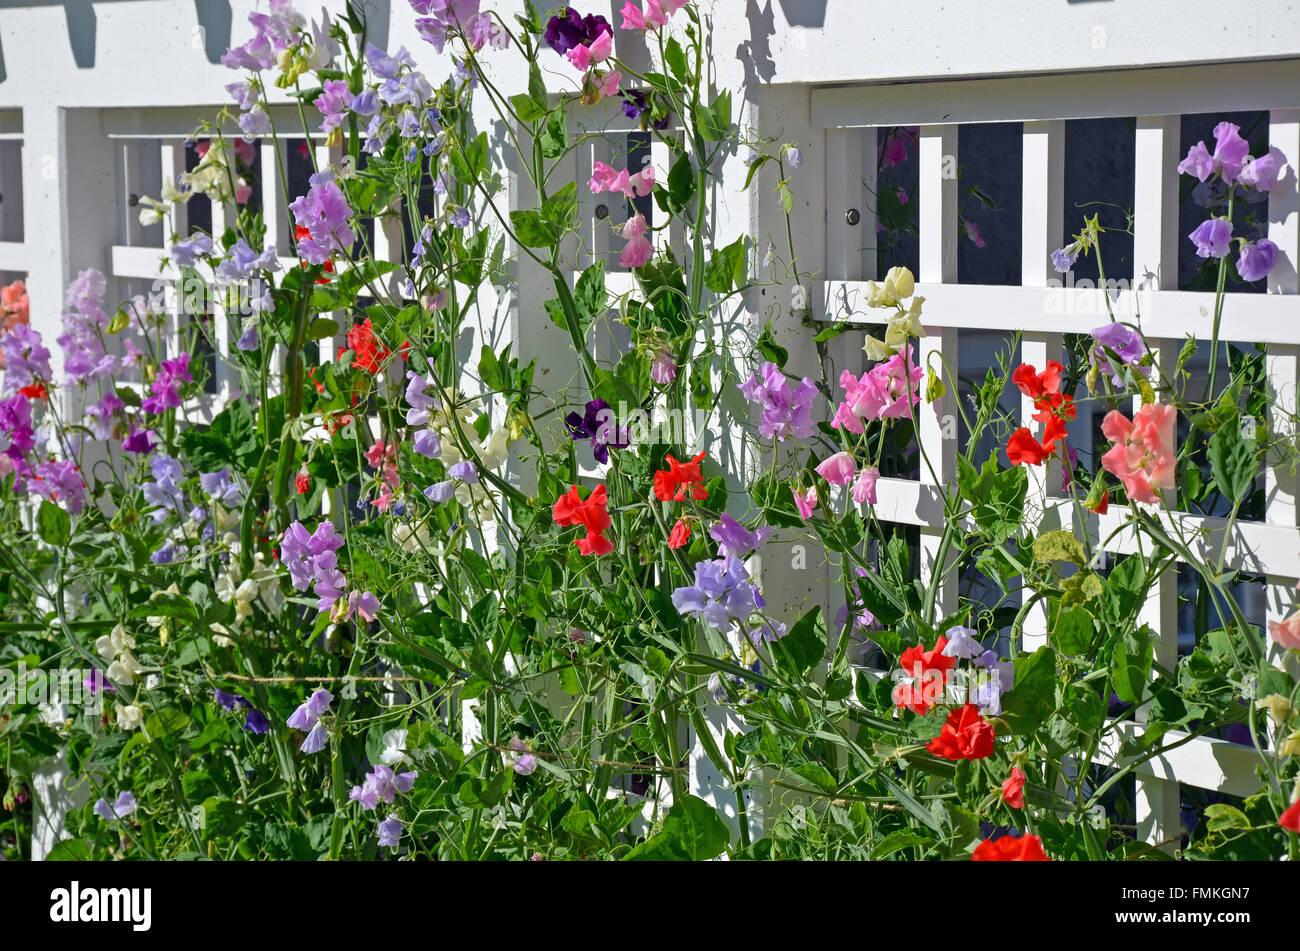 Colorful Sweet Pea Flowers Growing On Trellis Stock Photo